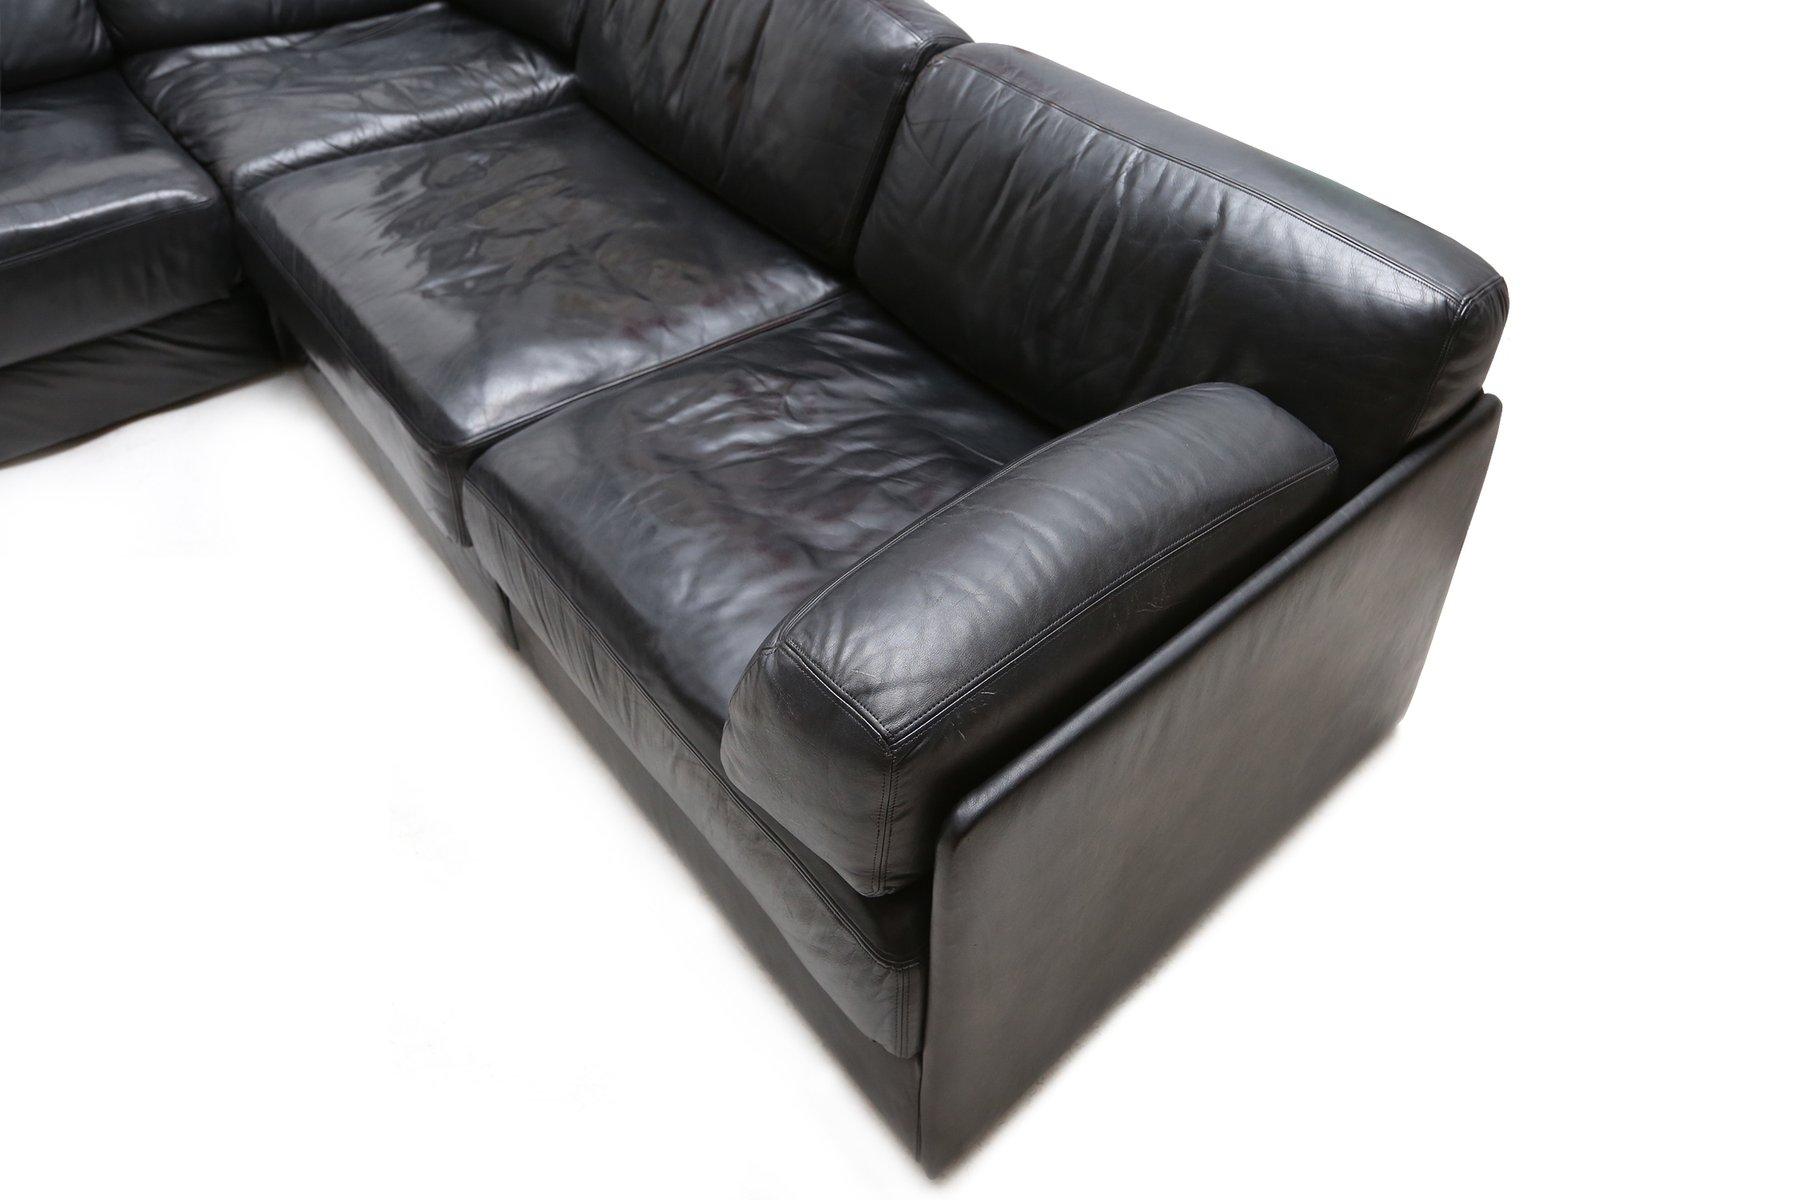 vintage ds 76 l shaped black leather sofa from de sede 1970s for sale at pamono. Black Bedroom Furniture Sets. Home Design Ideas